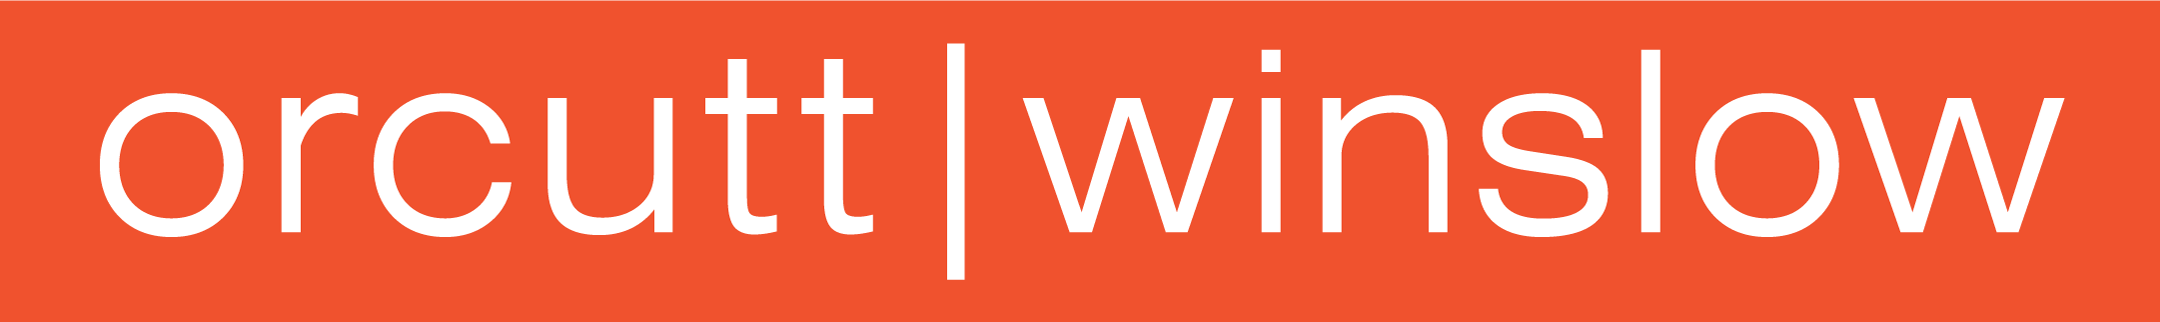 orcutt winslow logo